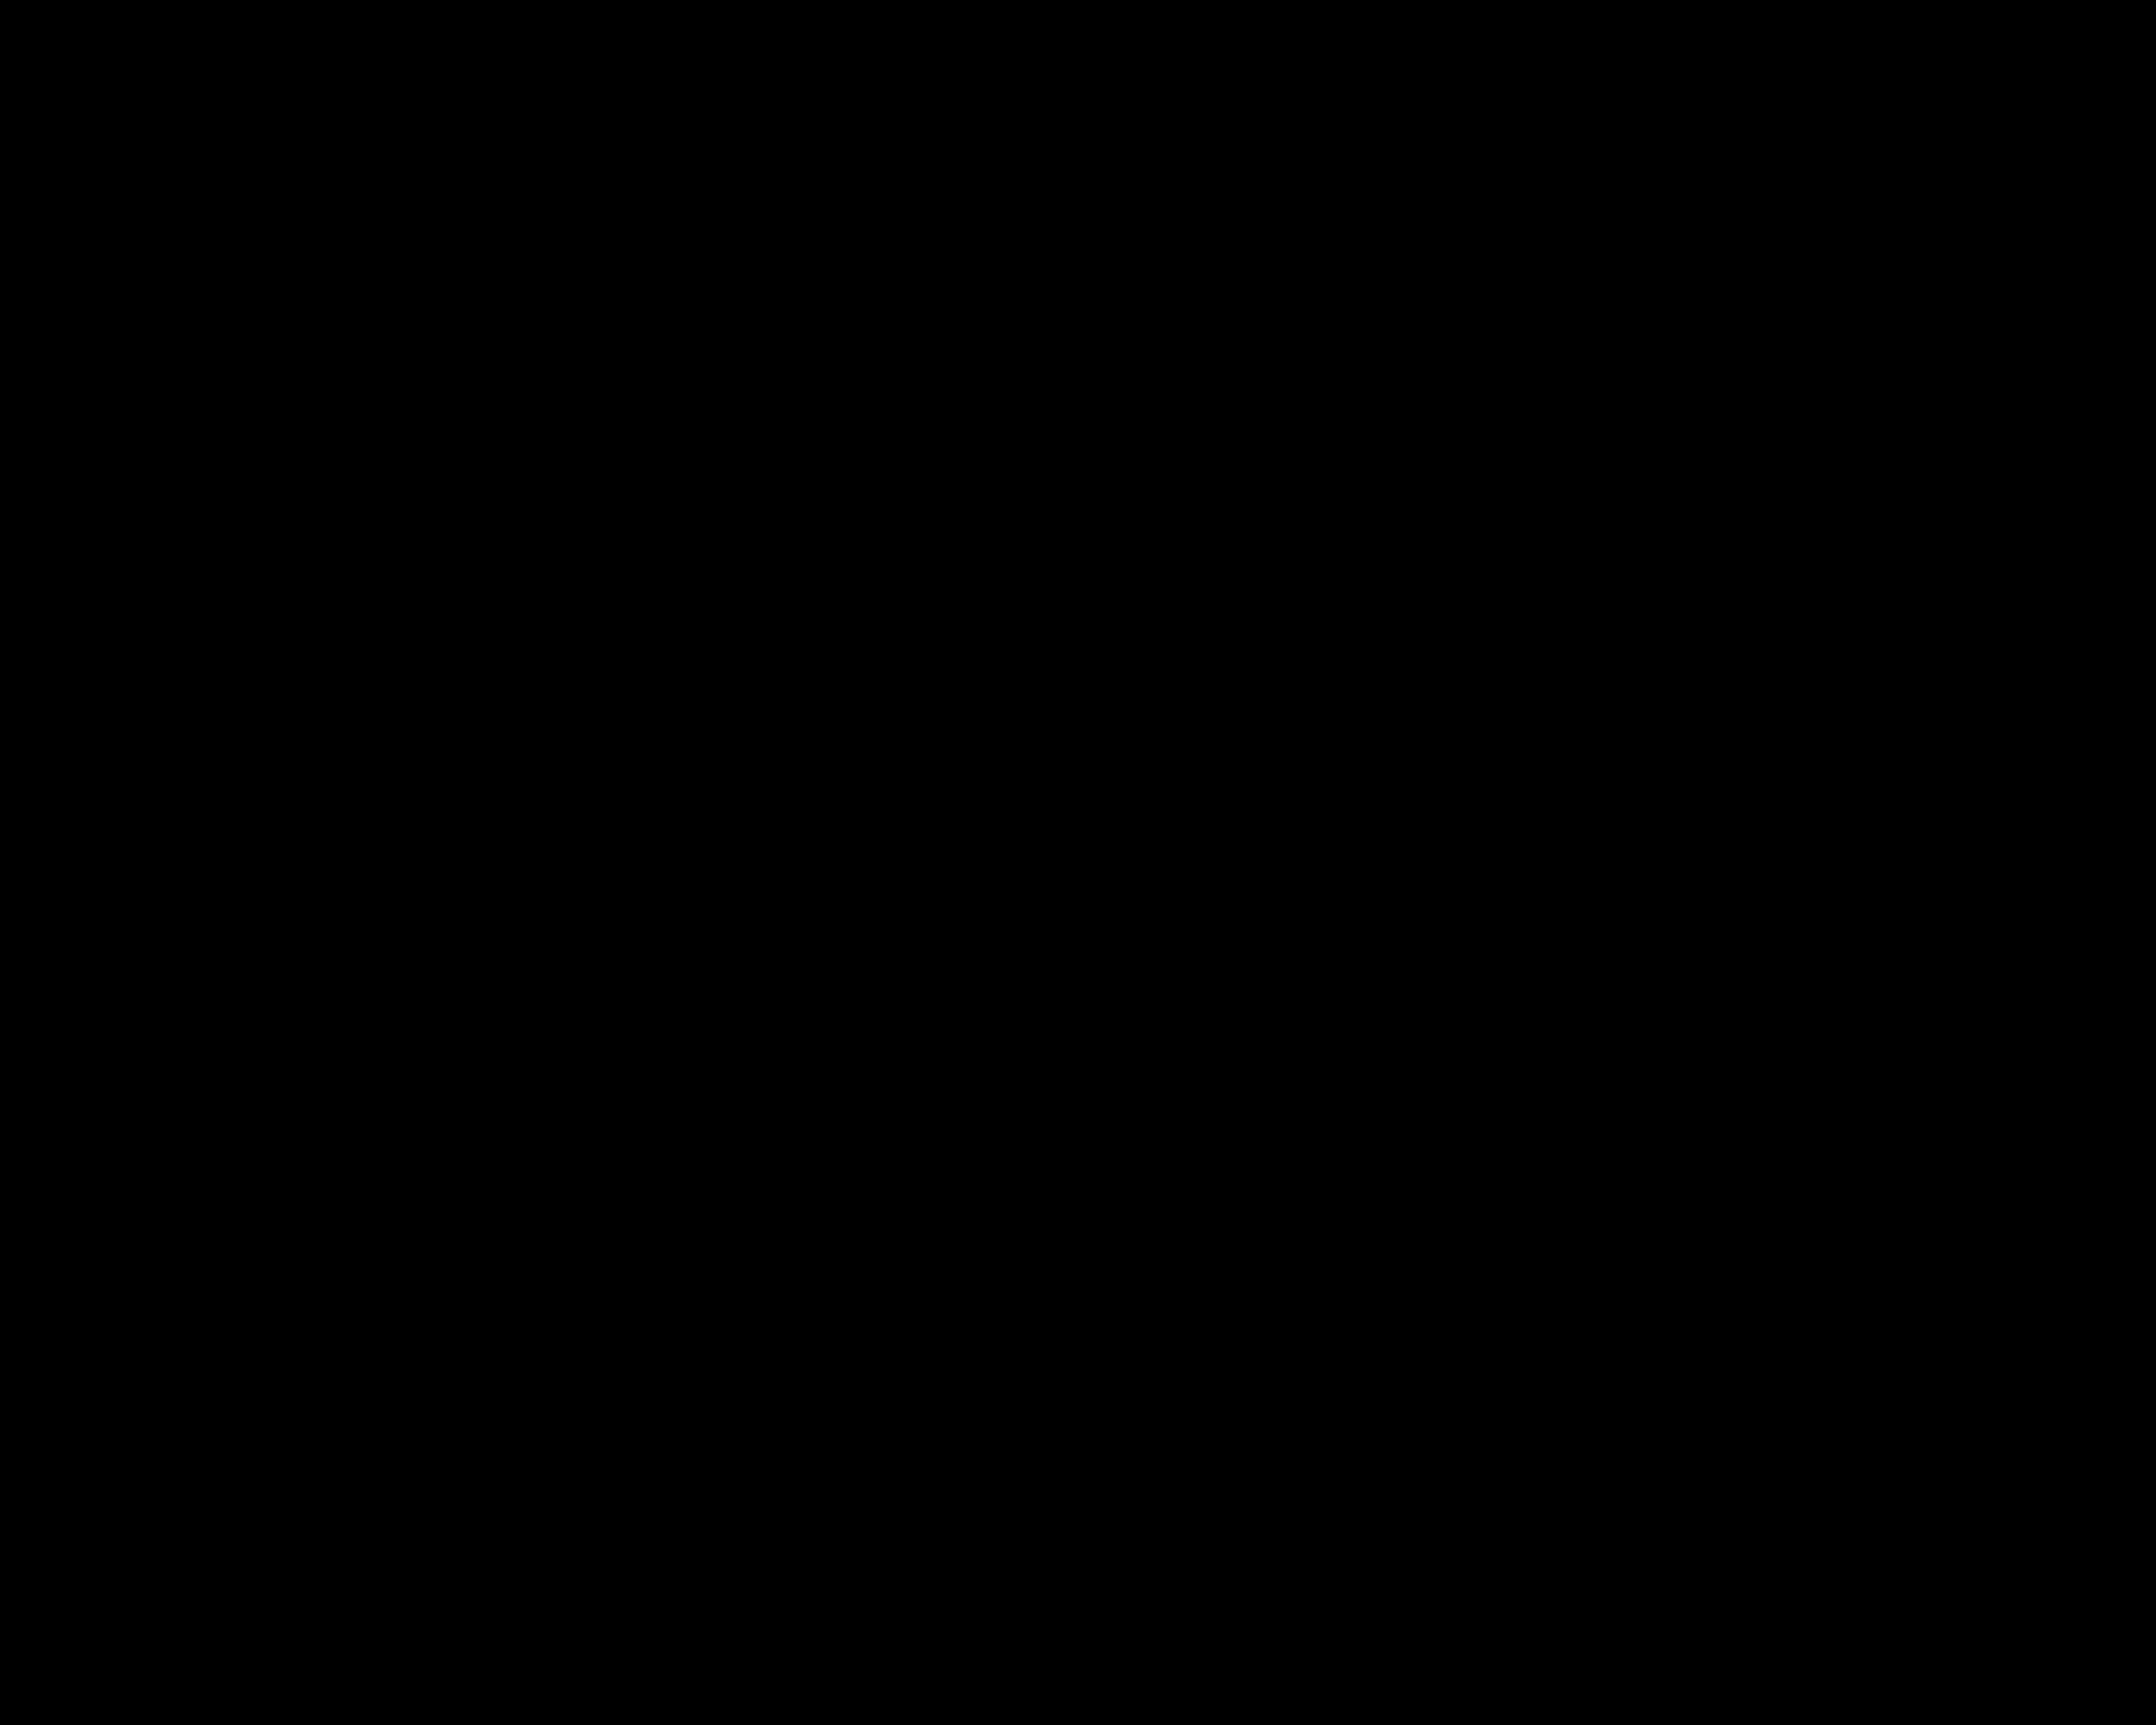 jeyhump-logo-03 (2).png